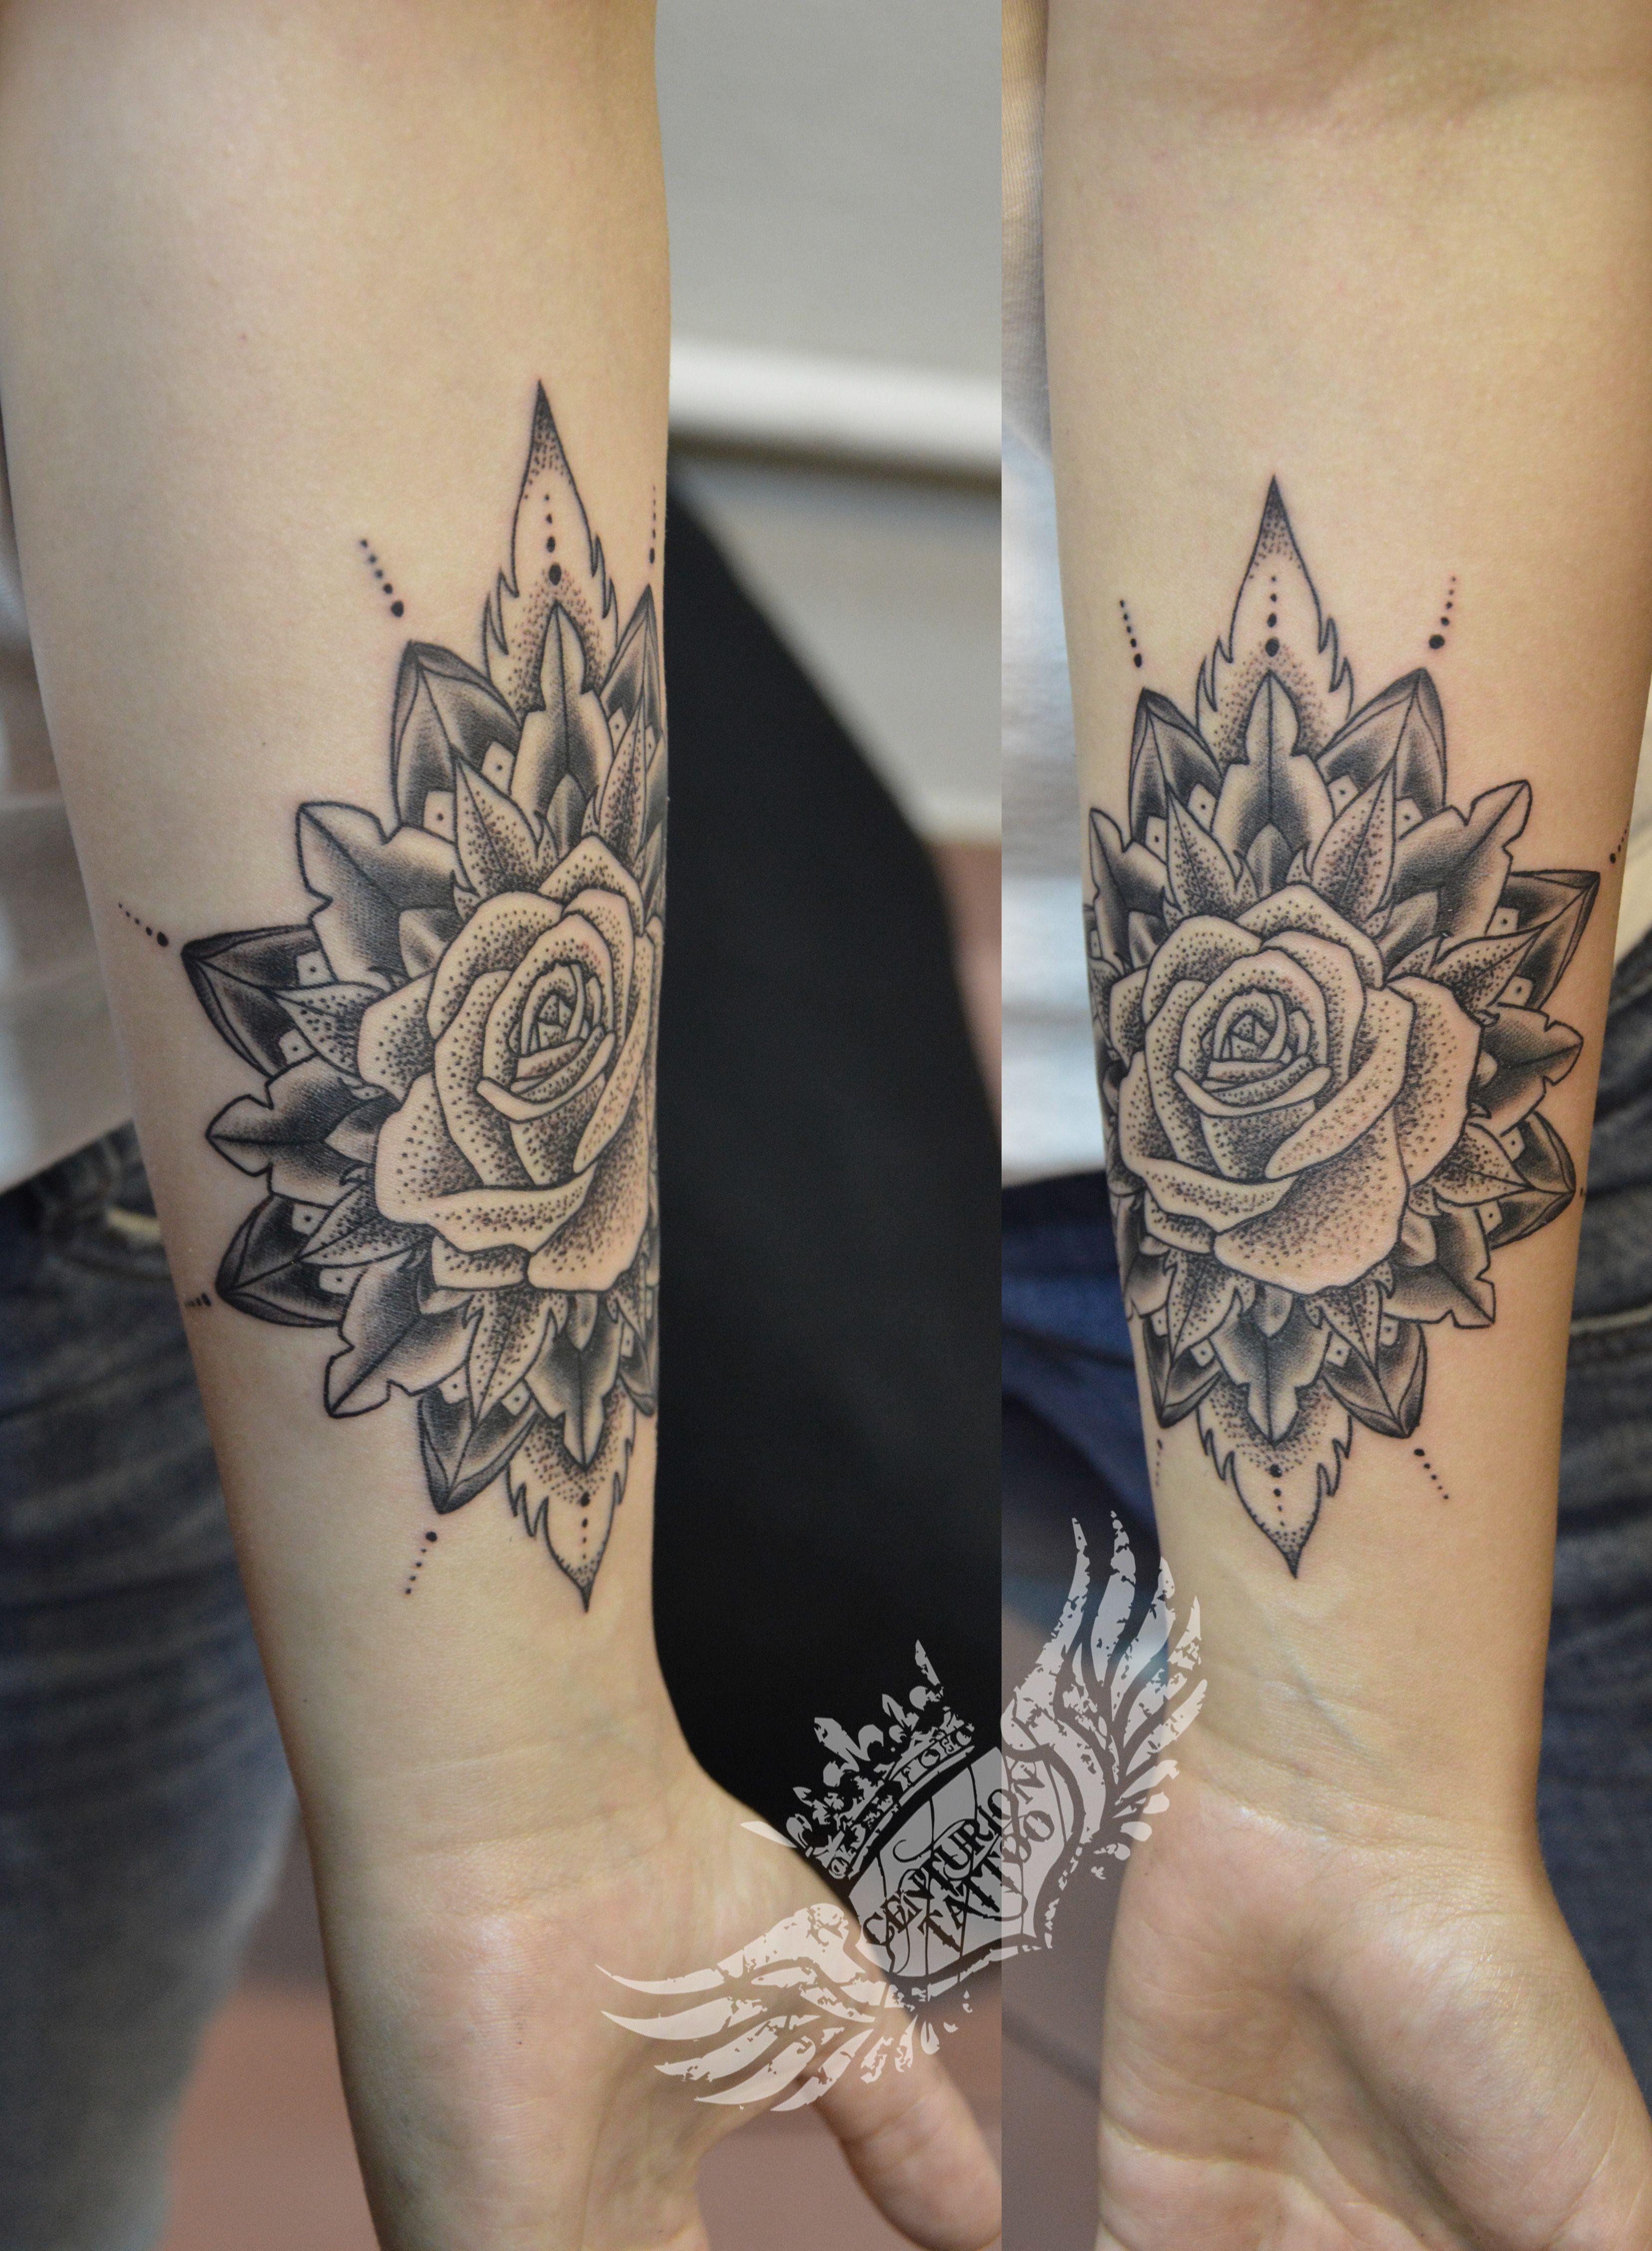 mandala dotwork rose tattoo tattoo centuriontattoo. Black Bedroom Furniture Sets. Home Design Ideas